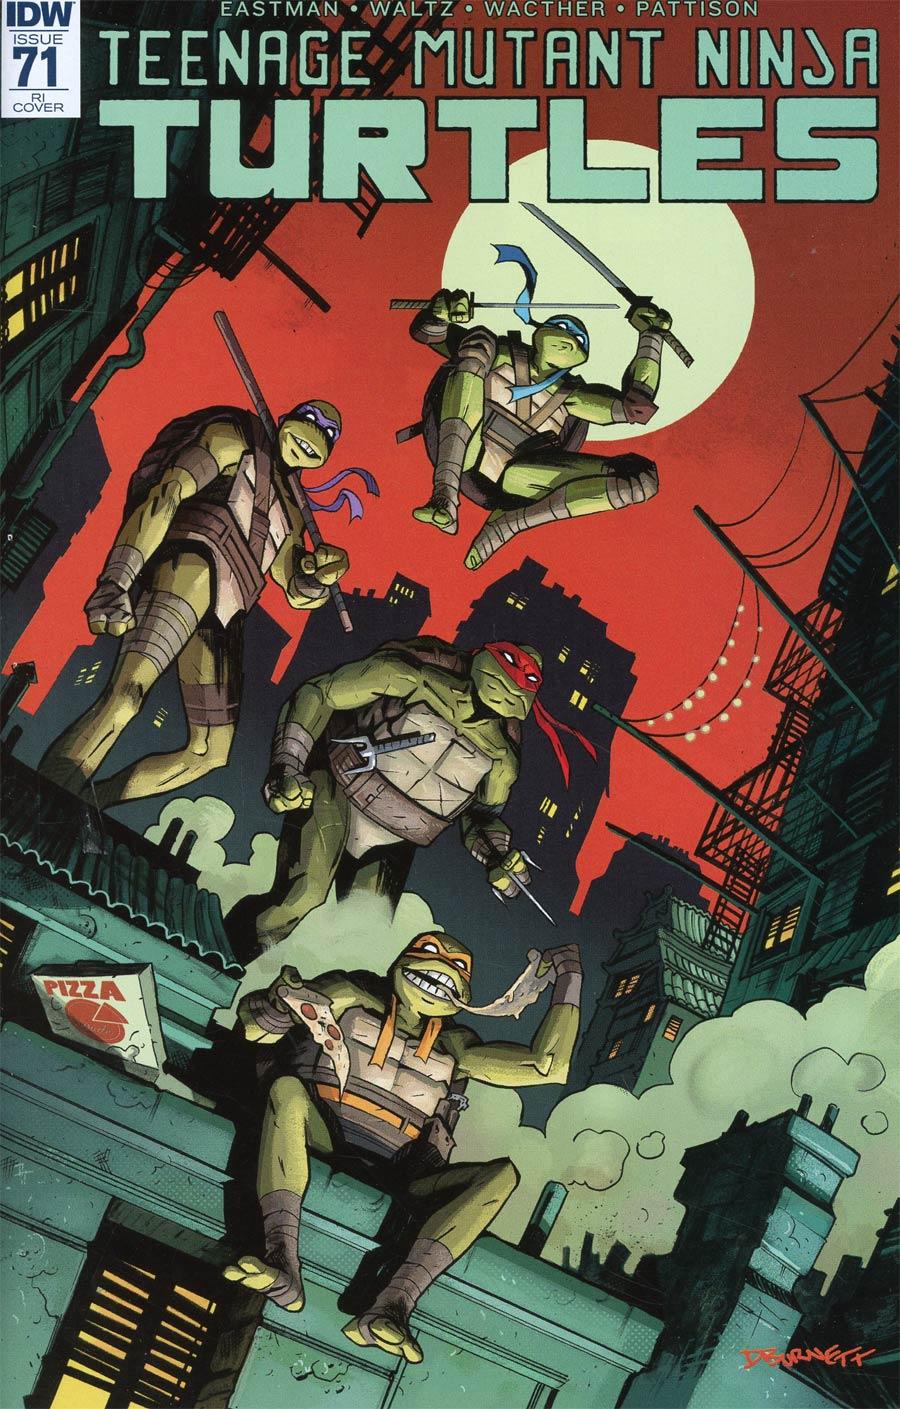 Teenage Mutant Ninja Turtles Vol 5 #71 Cover C Incentive Dylan Burnet Variant Cover